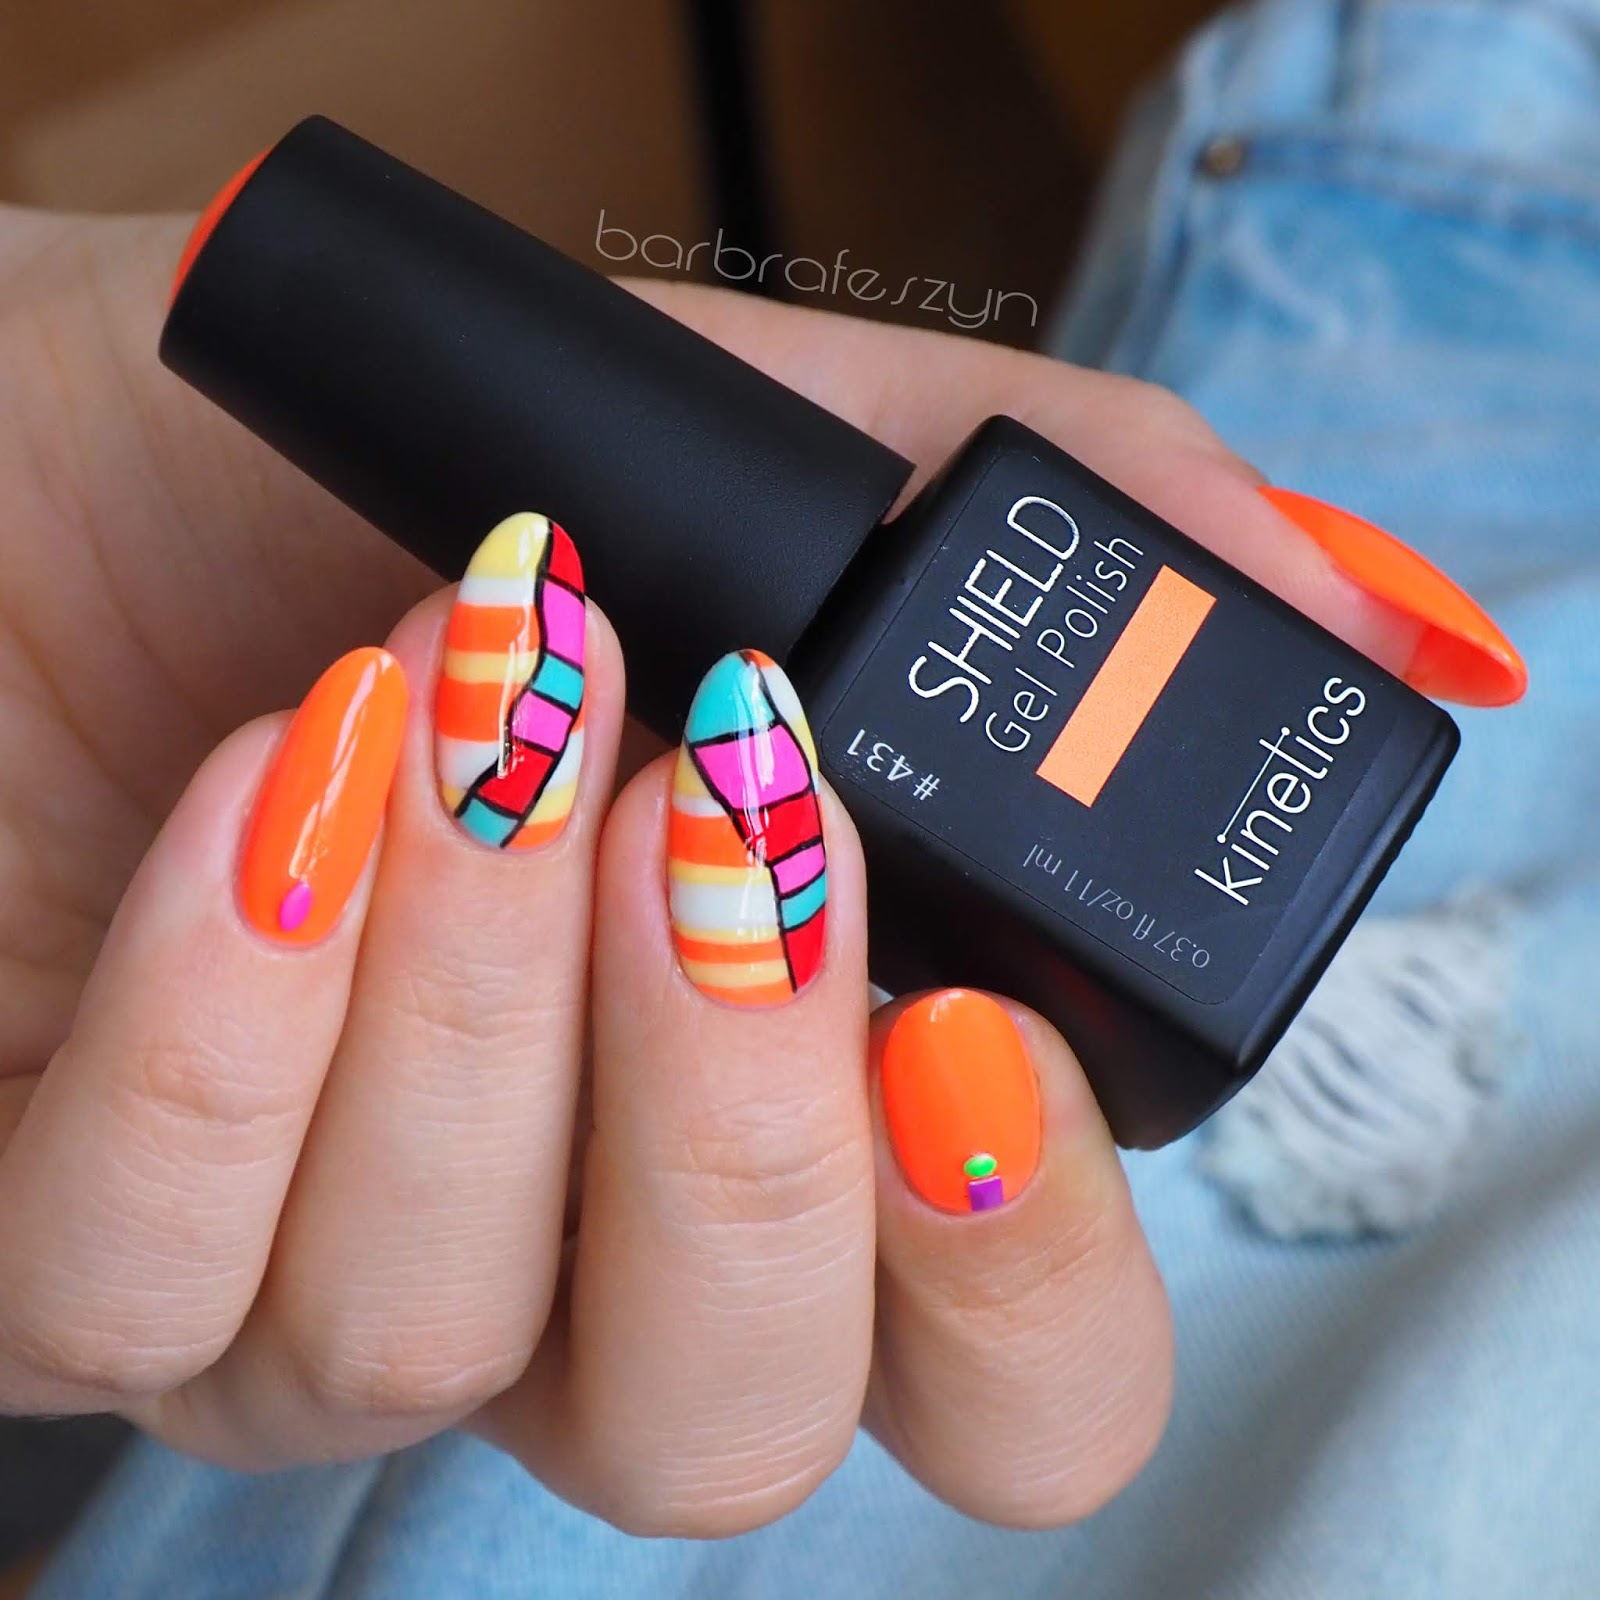 Kolorowe Paznokcie Na Lato Barbrafeszyn Blog O Paznokciach